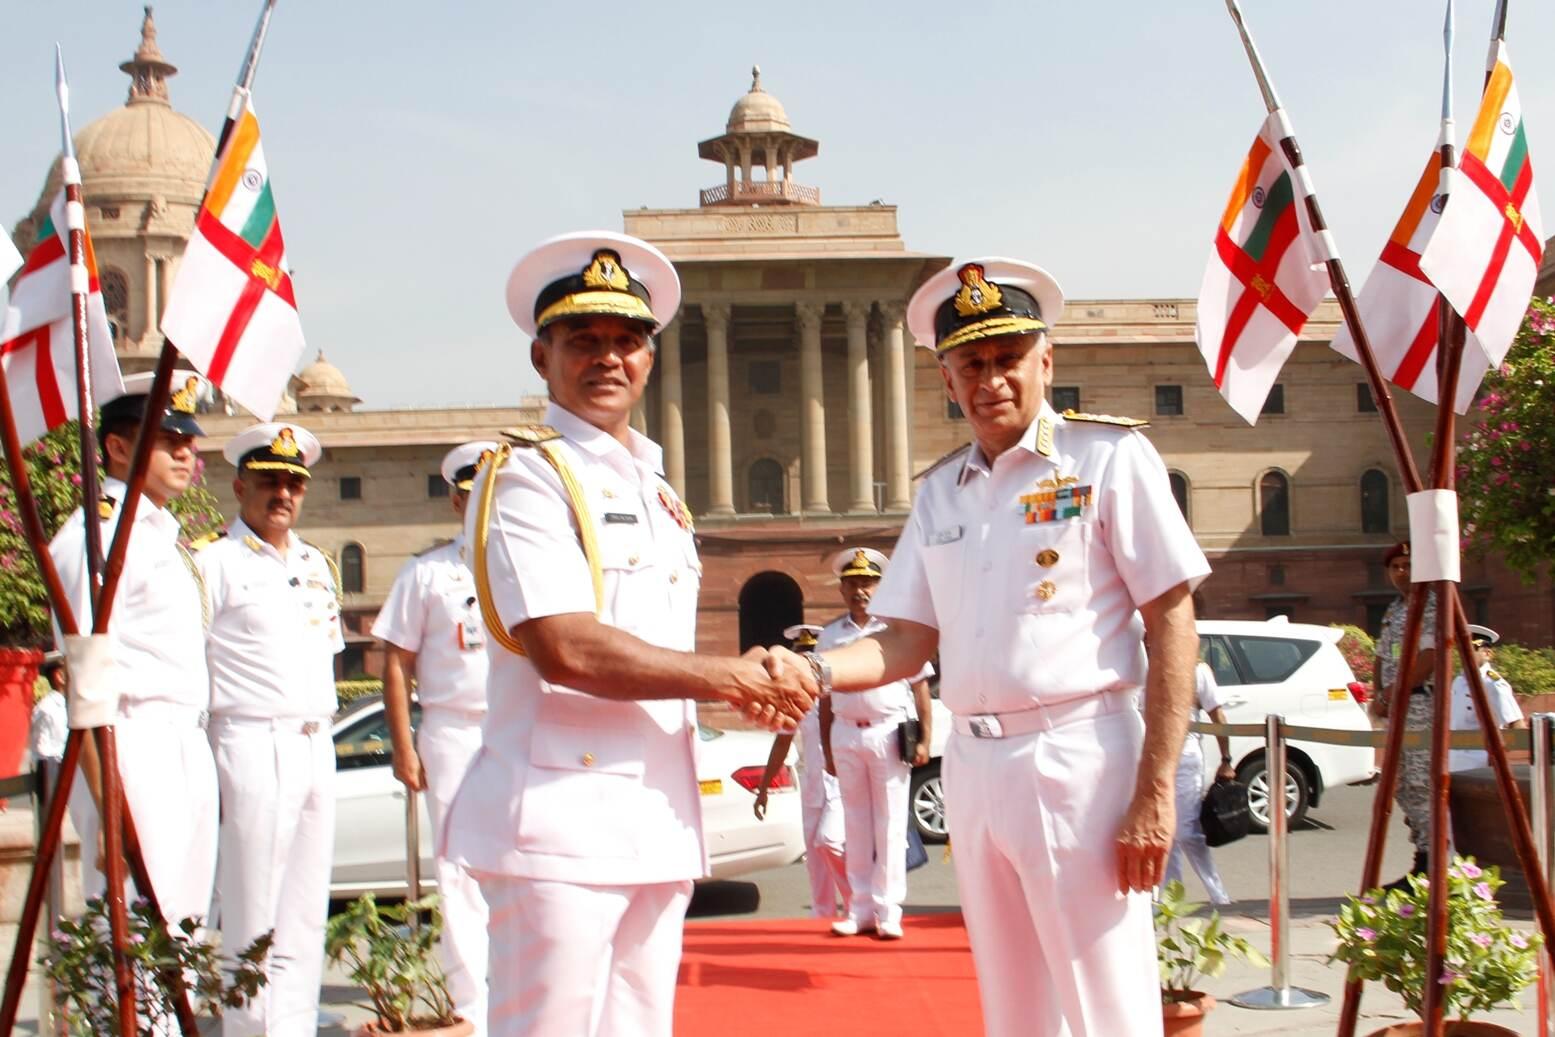 Visit of Vice Admiral Piyal De Silva, Commander of the Sri Lankan Navy